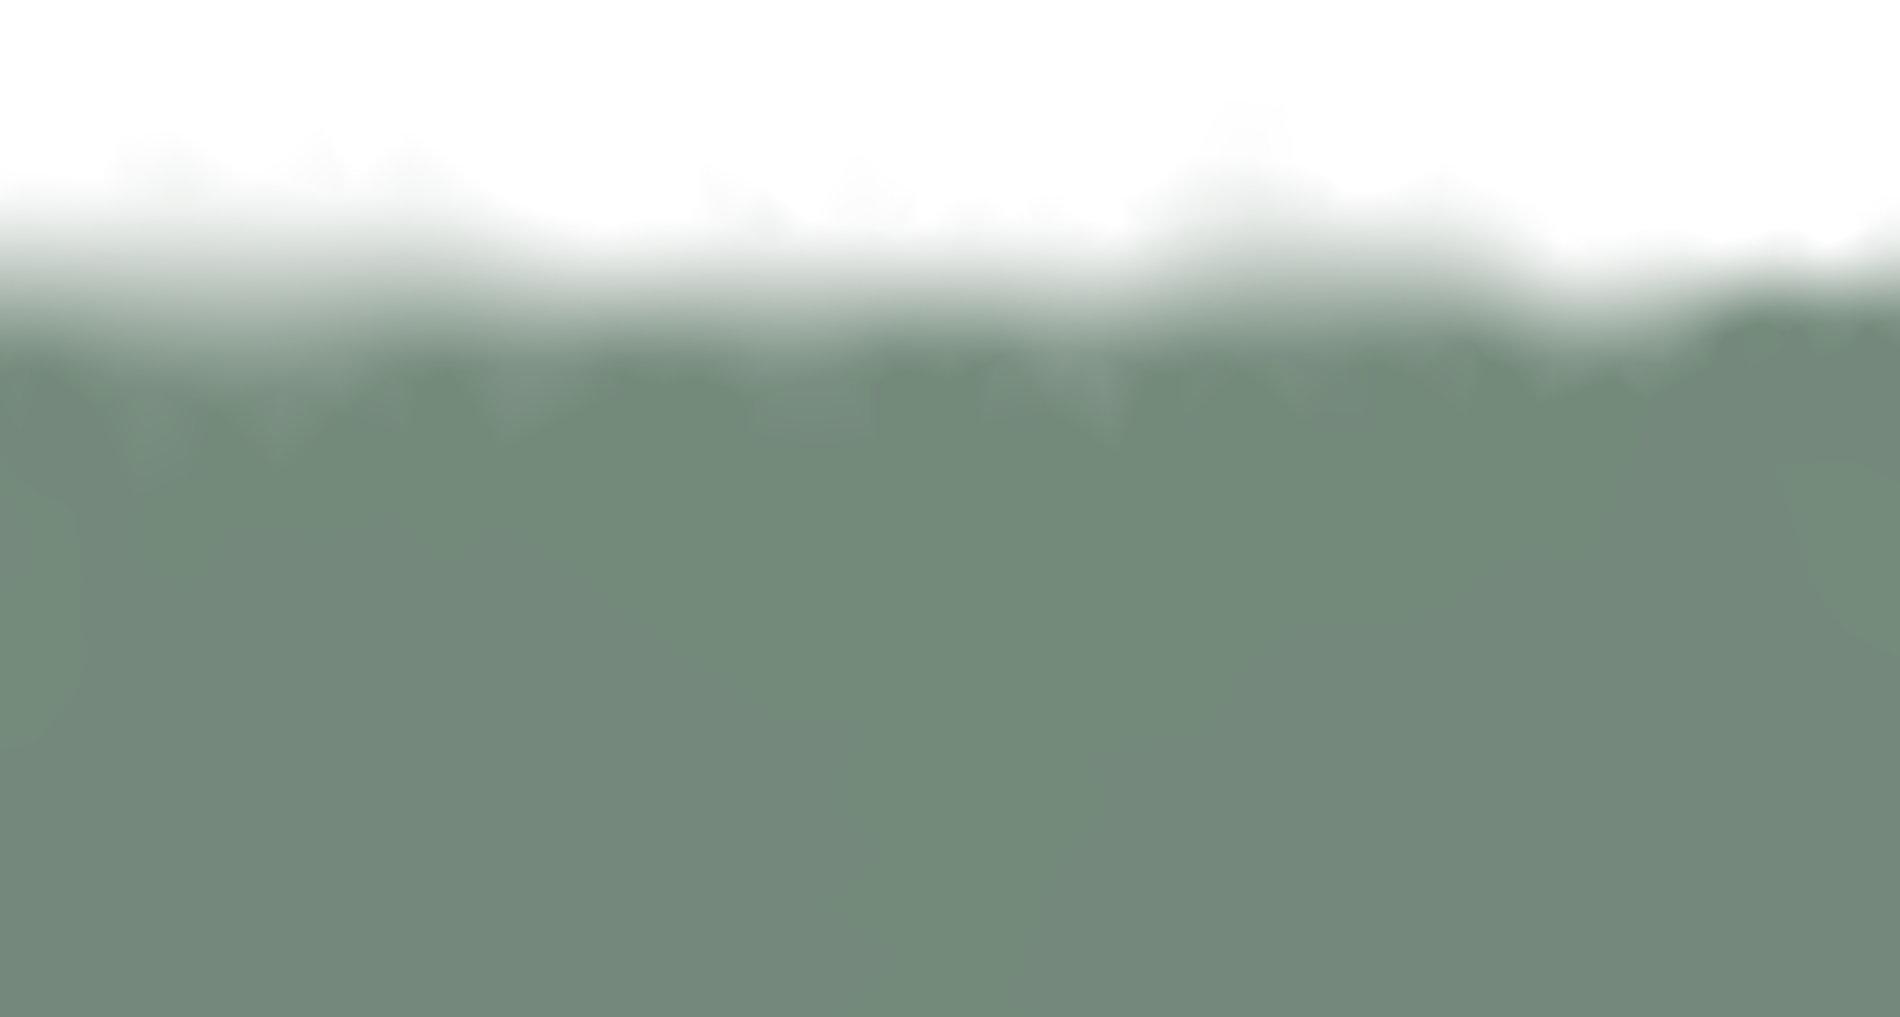 Website-Background-emgallery-5.jpg